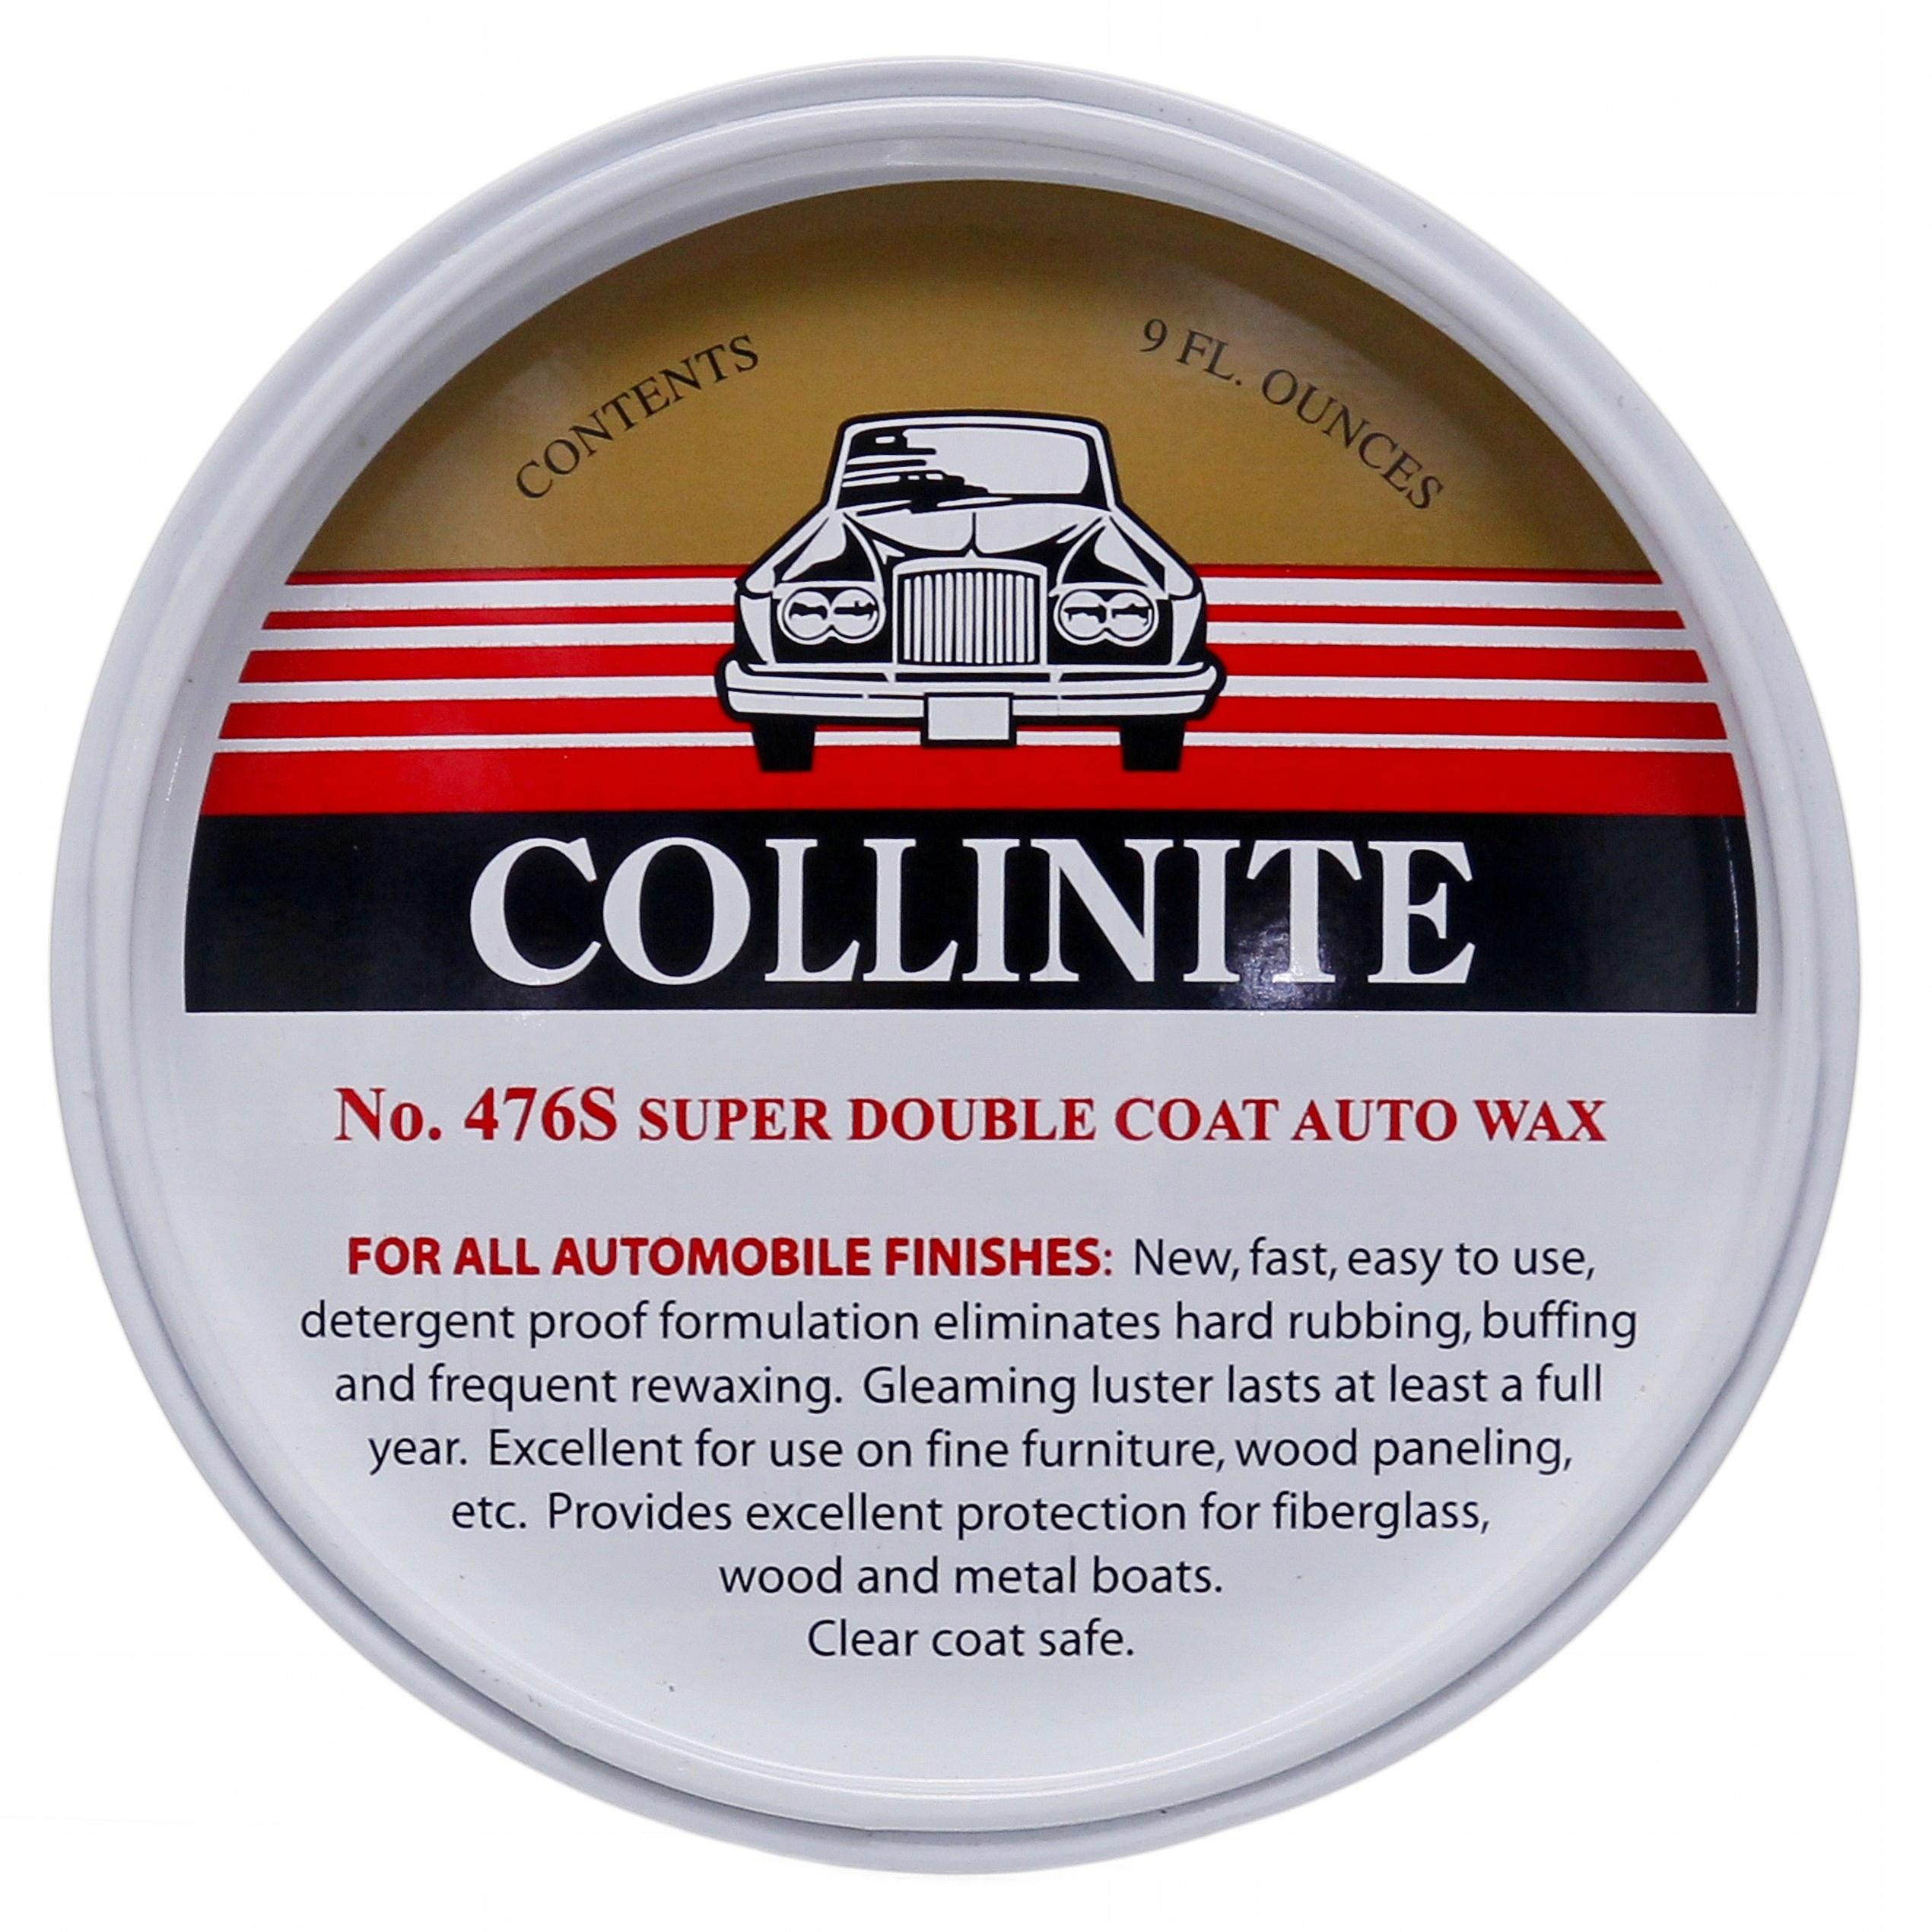 Collinite 476 Супер DoubleCoat Wax ЛЕГЕНДАРНЫЙ ВОСК